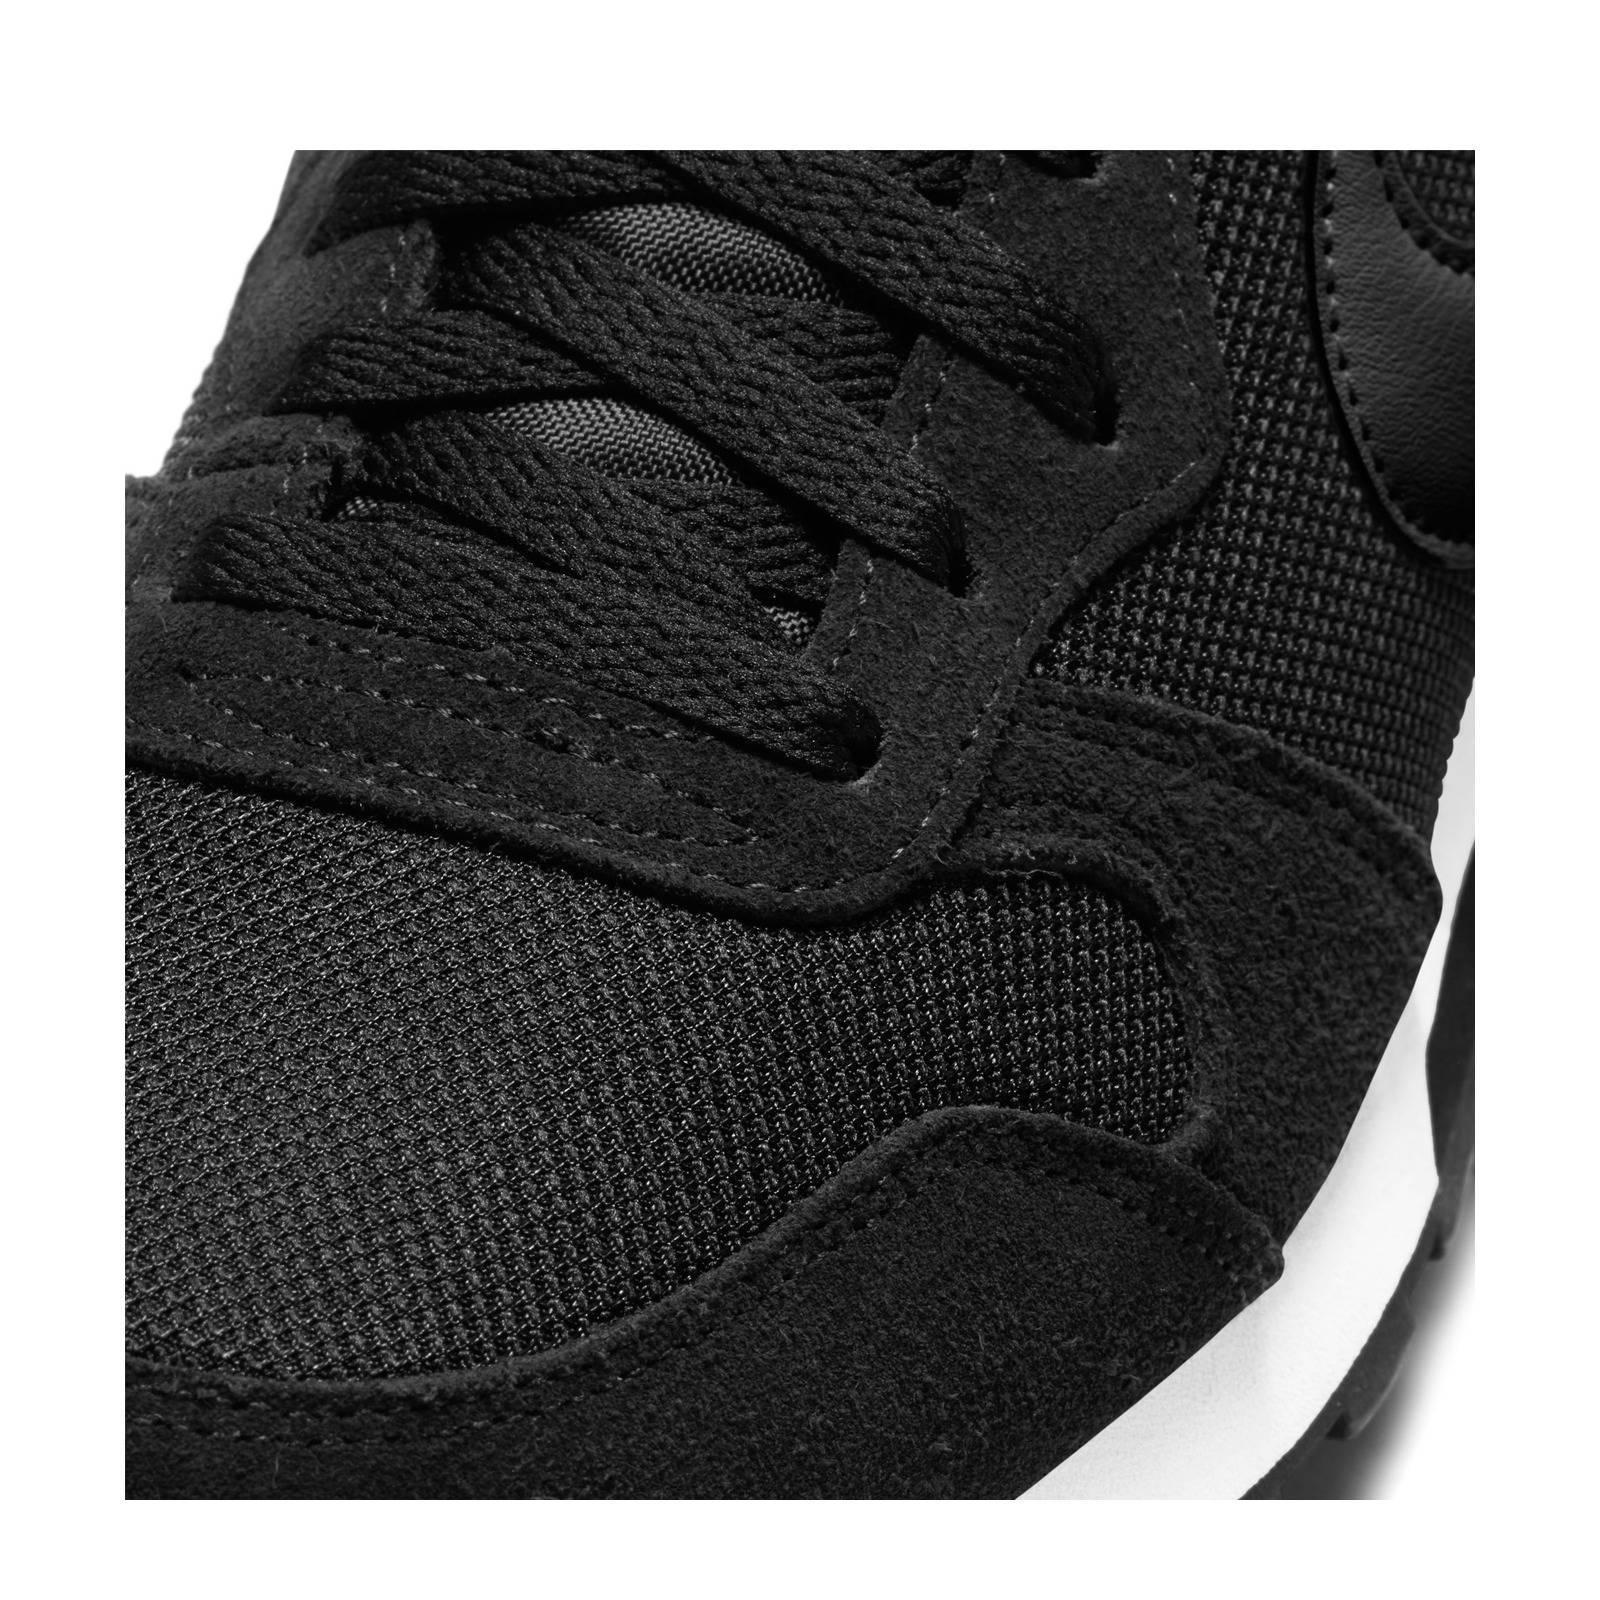 335440ca4e9 Nike MD Runner 2 sneakers | wehkamp